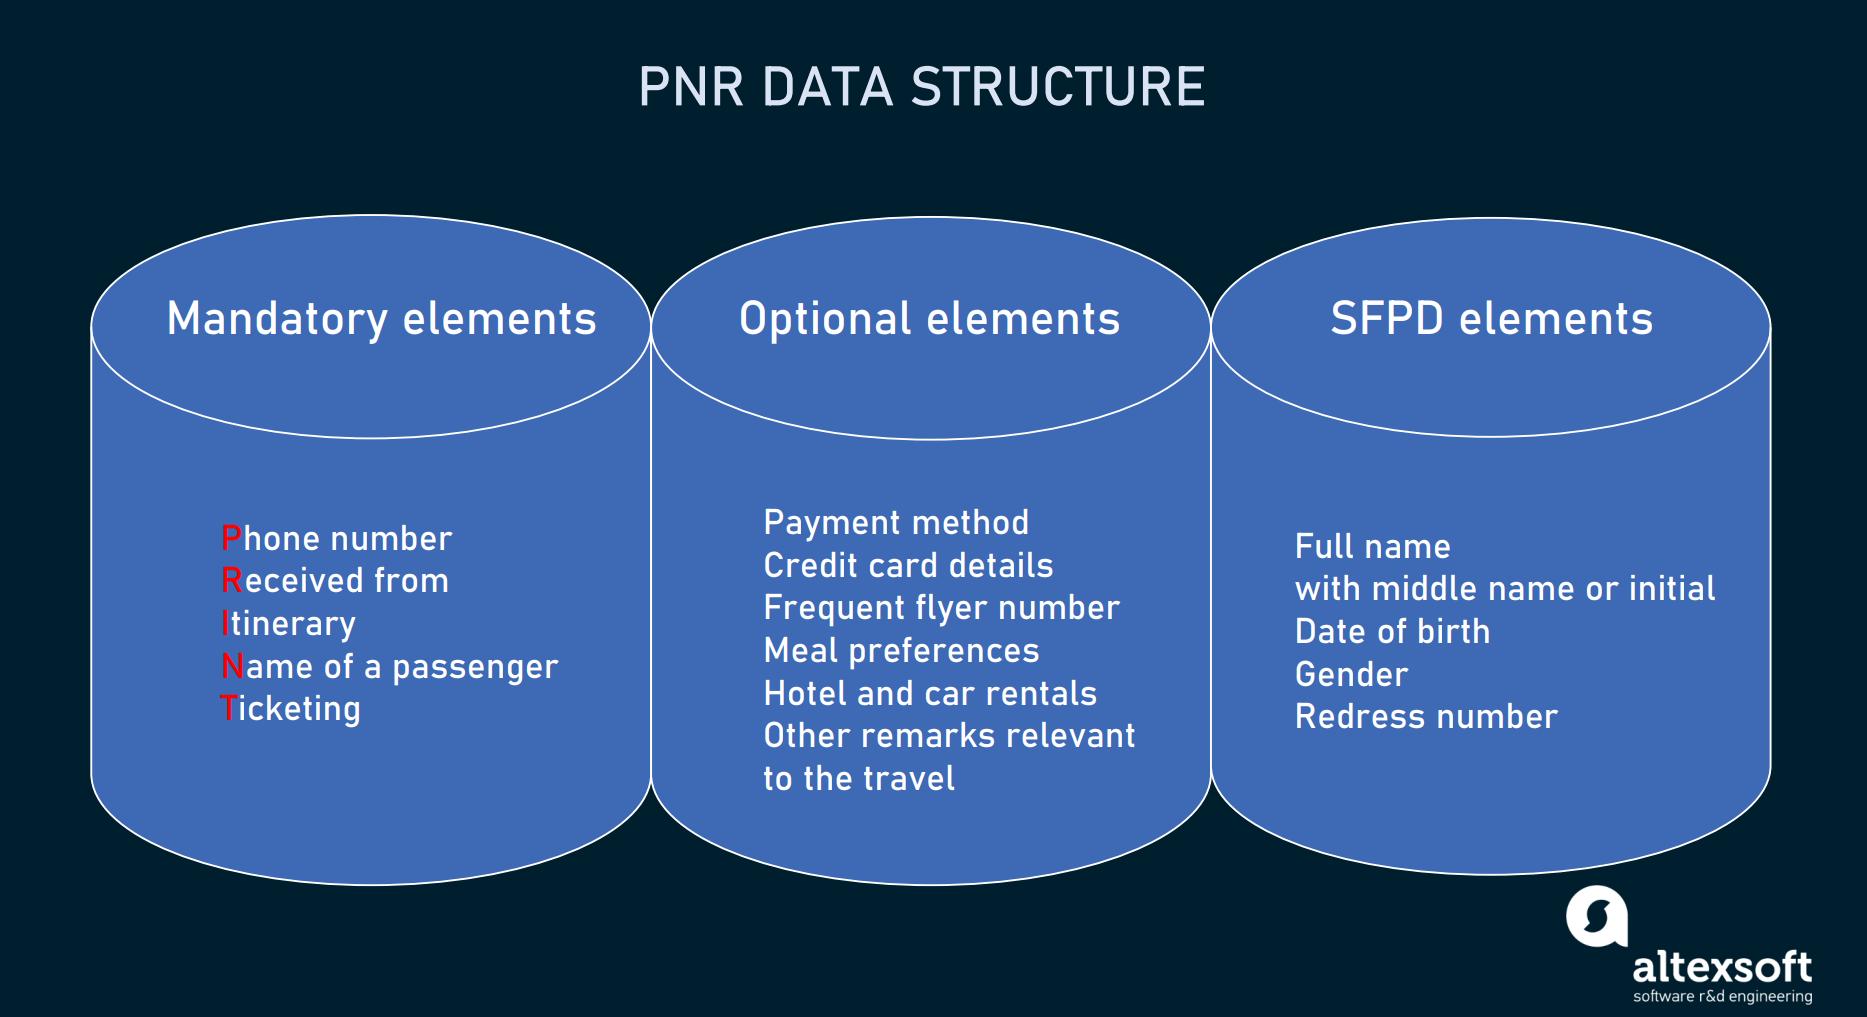 PNR file data elements